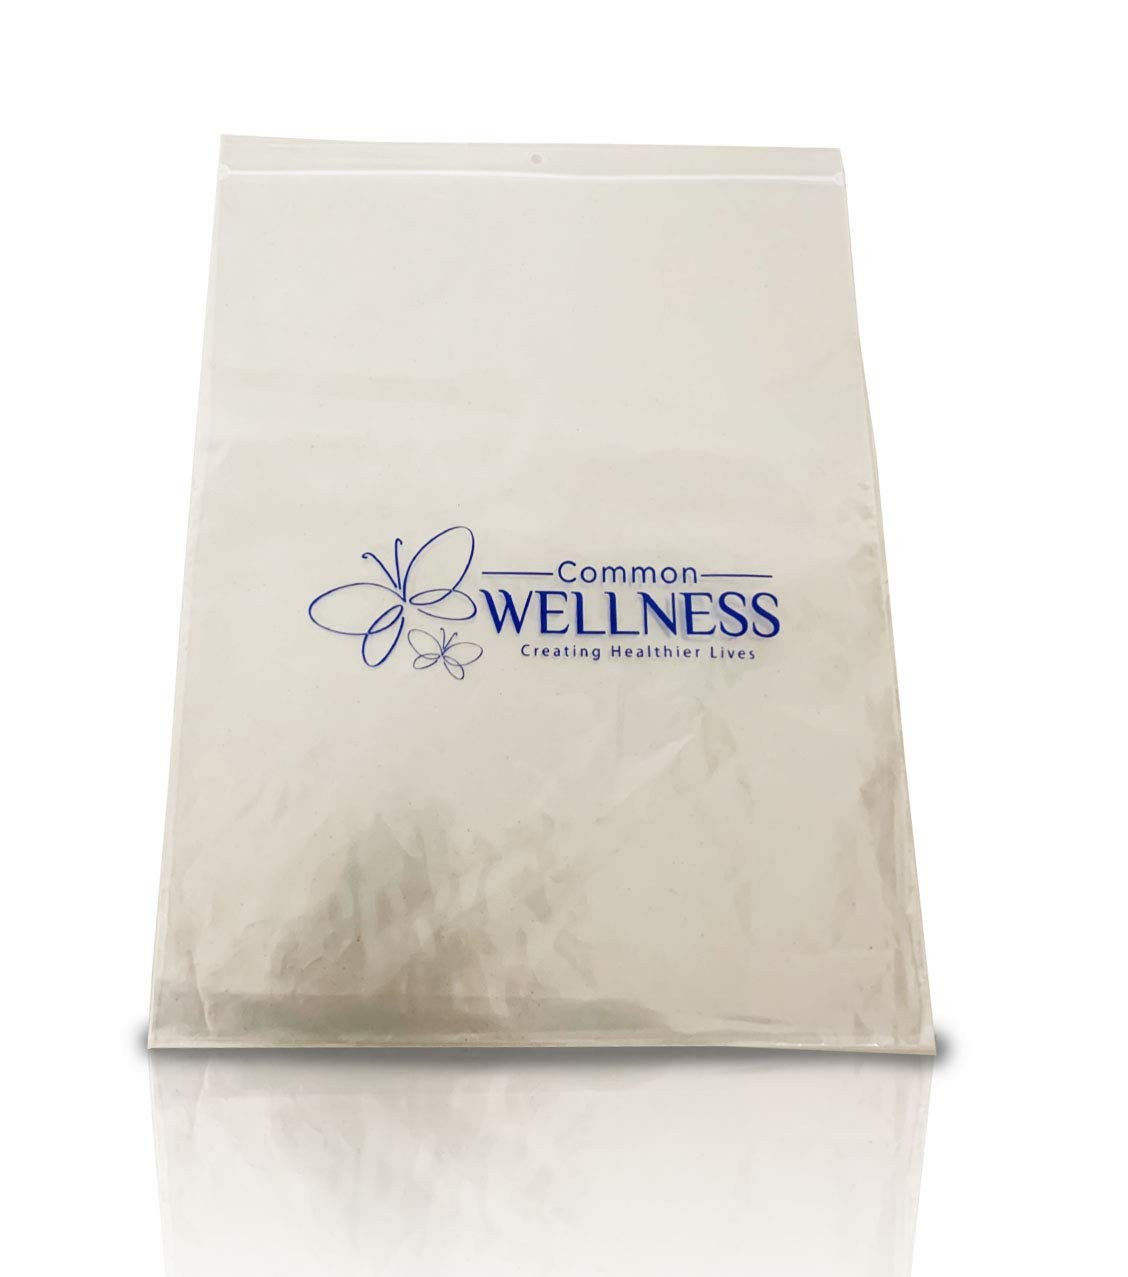 Zija Supermix Pure Moringa & Premium Tea Instant by Common Wellness Moringa (Image #2)